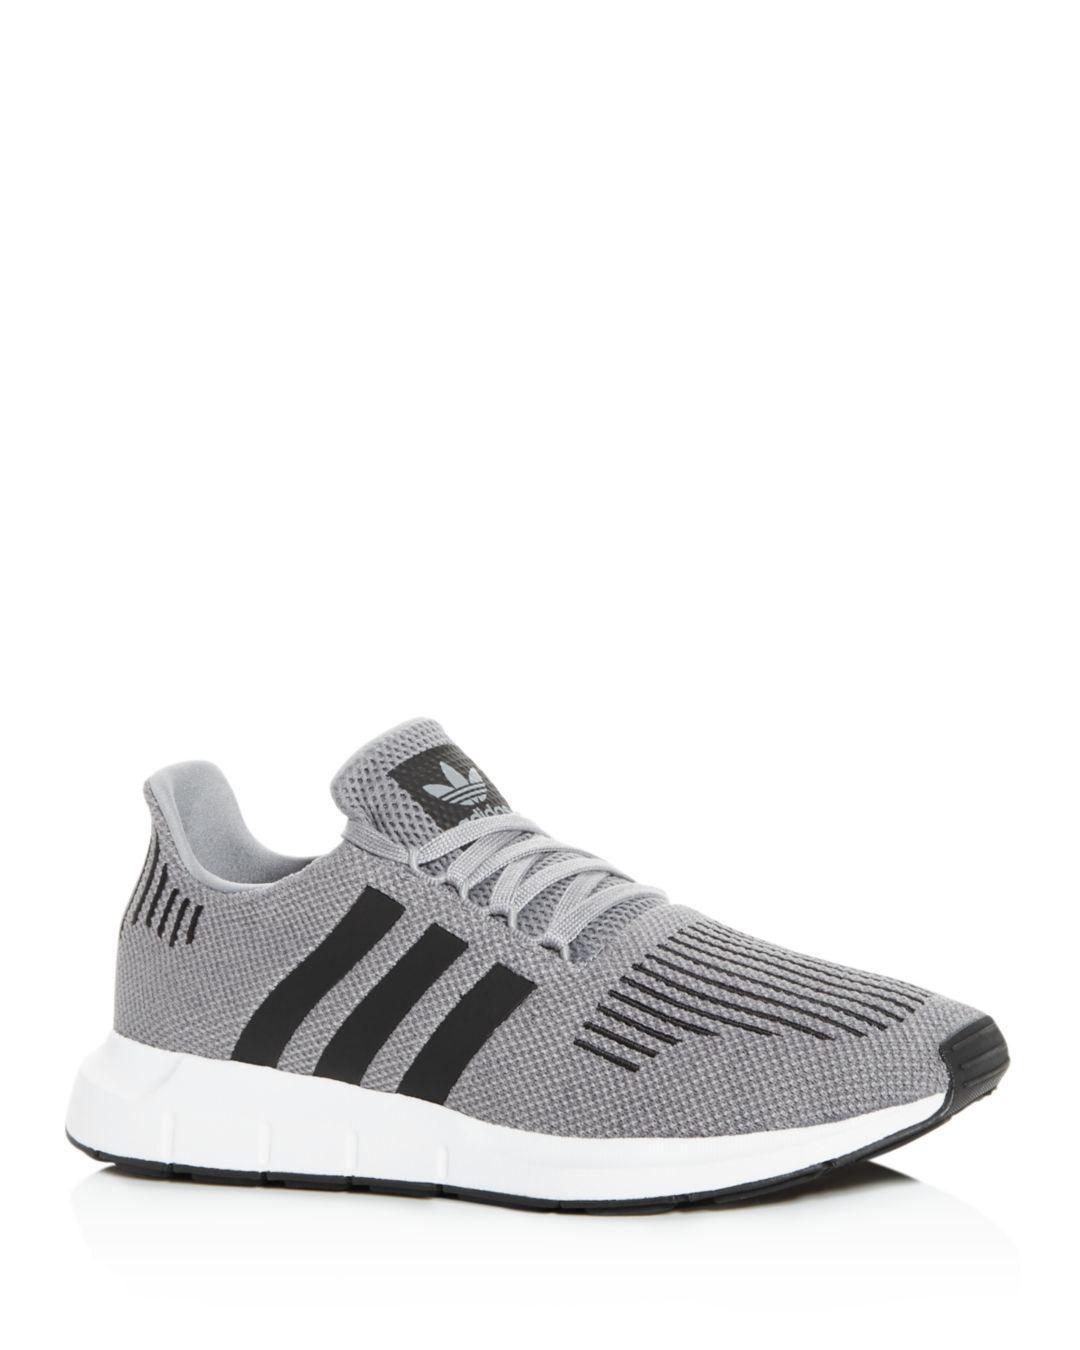 a52201f023925 adidas Men s Swift Run Knit Low-top Sneakers in Gray for Men - Lyst